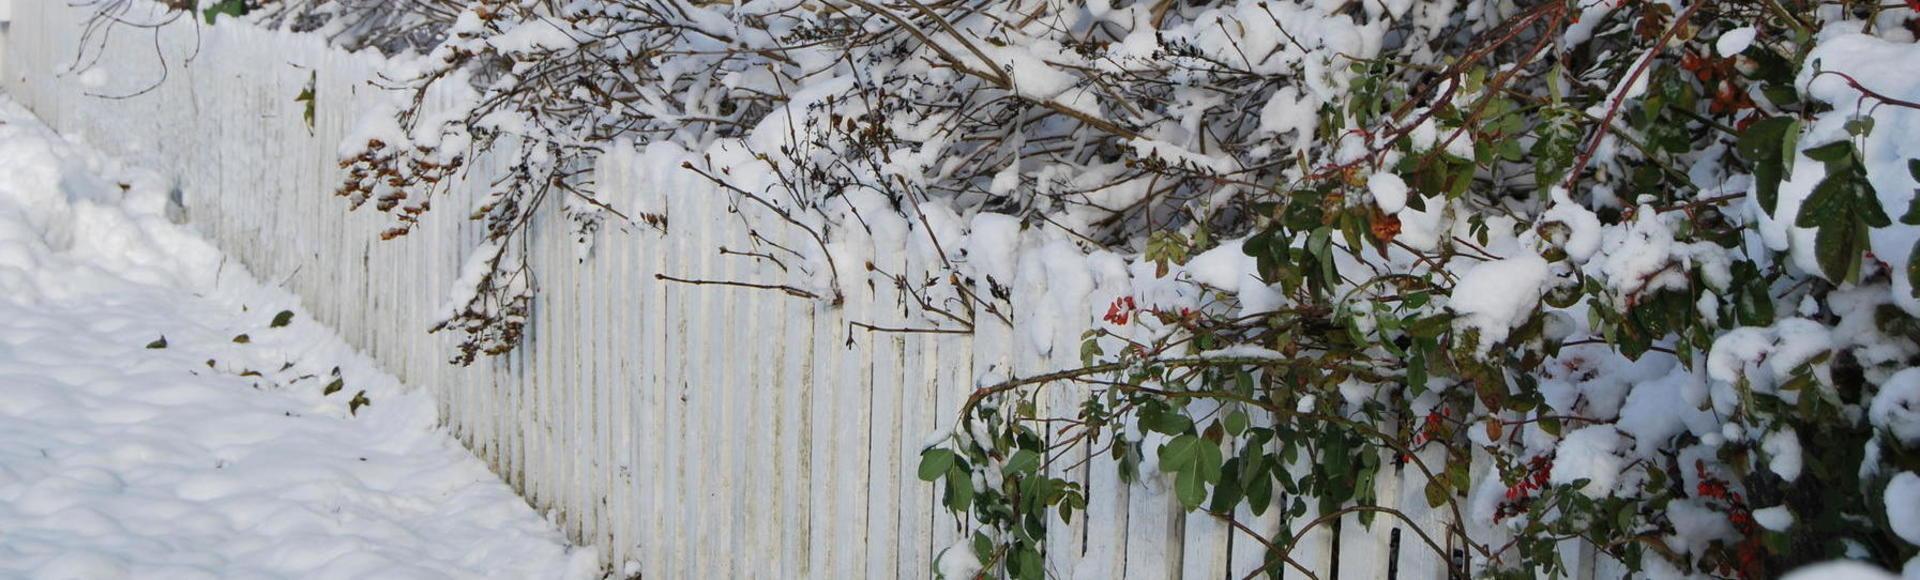 Häck vid staket